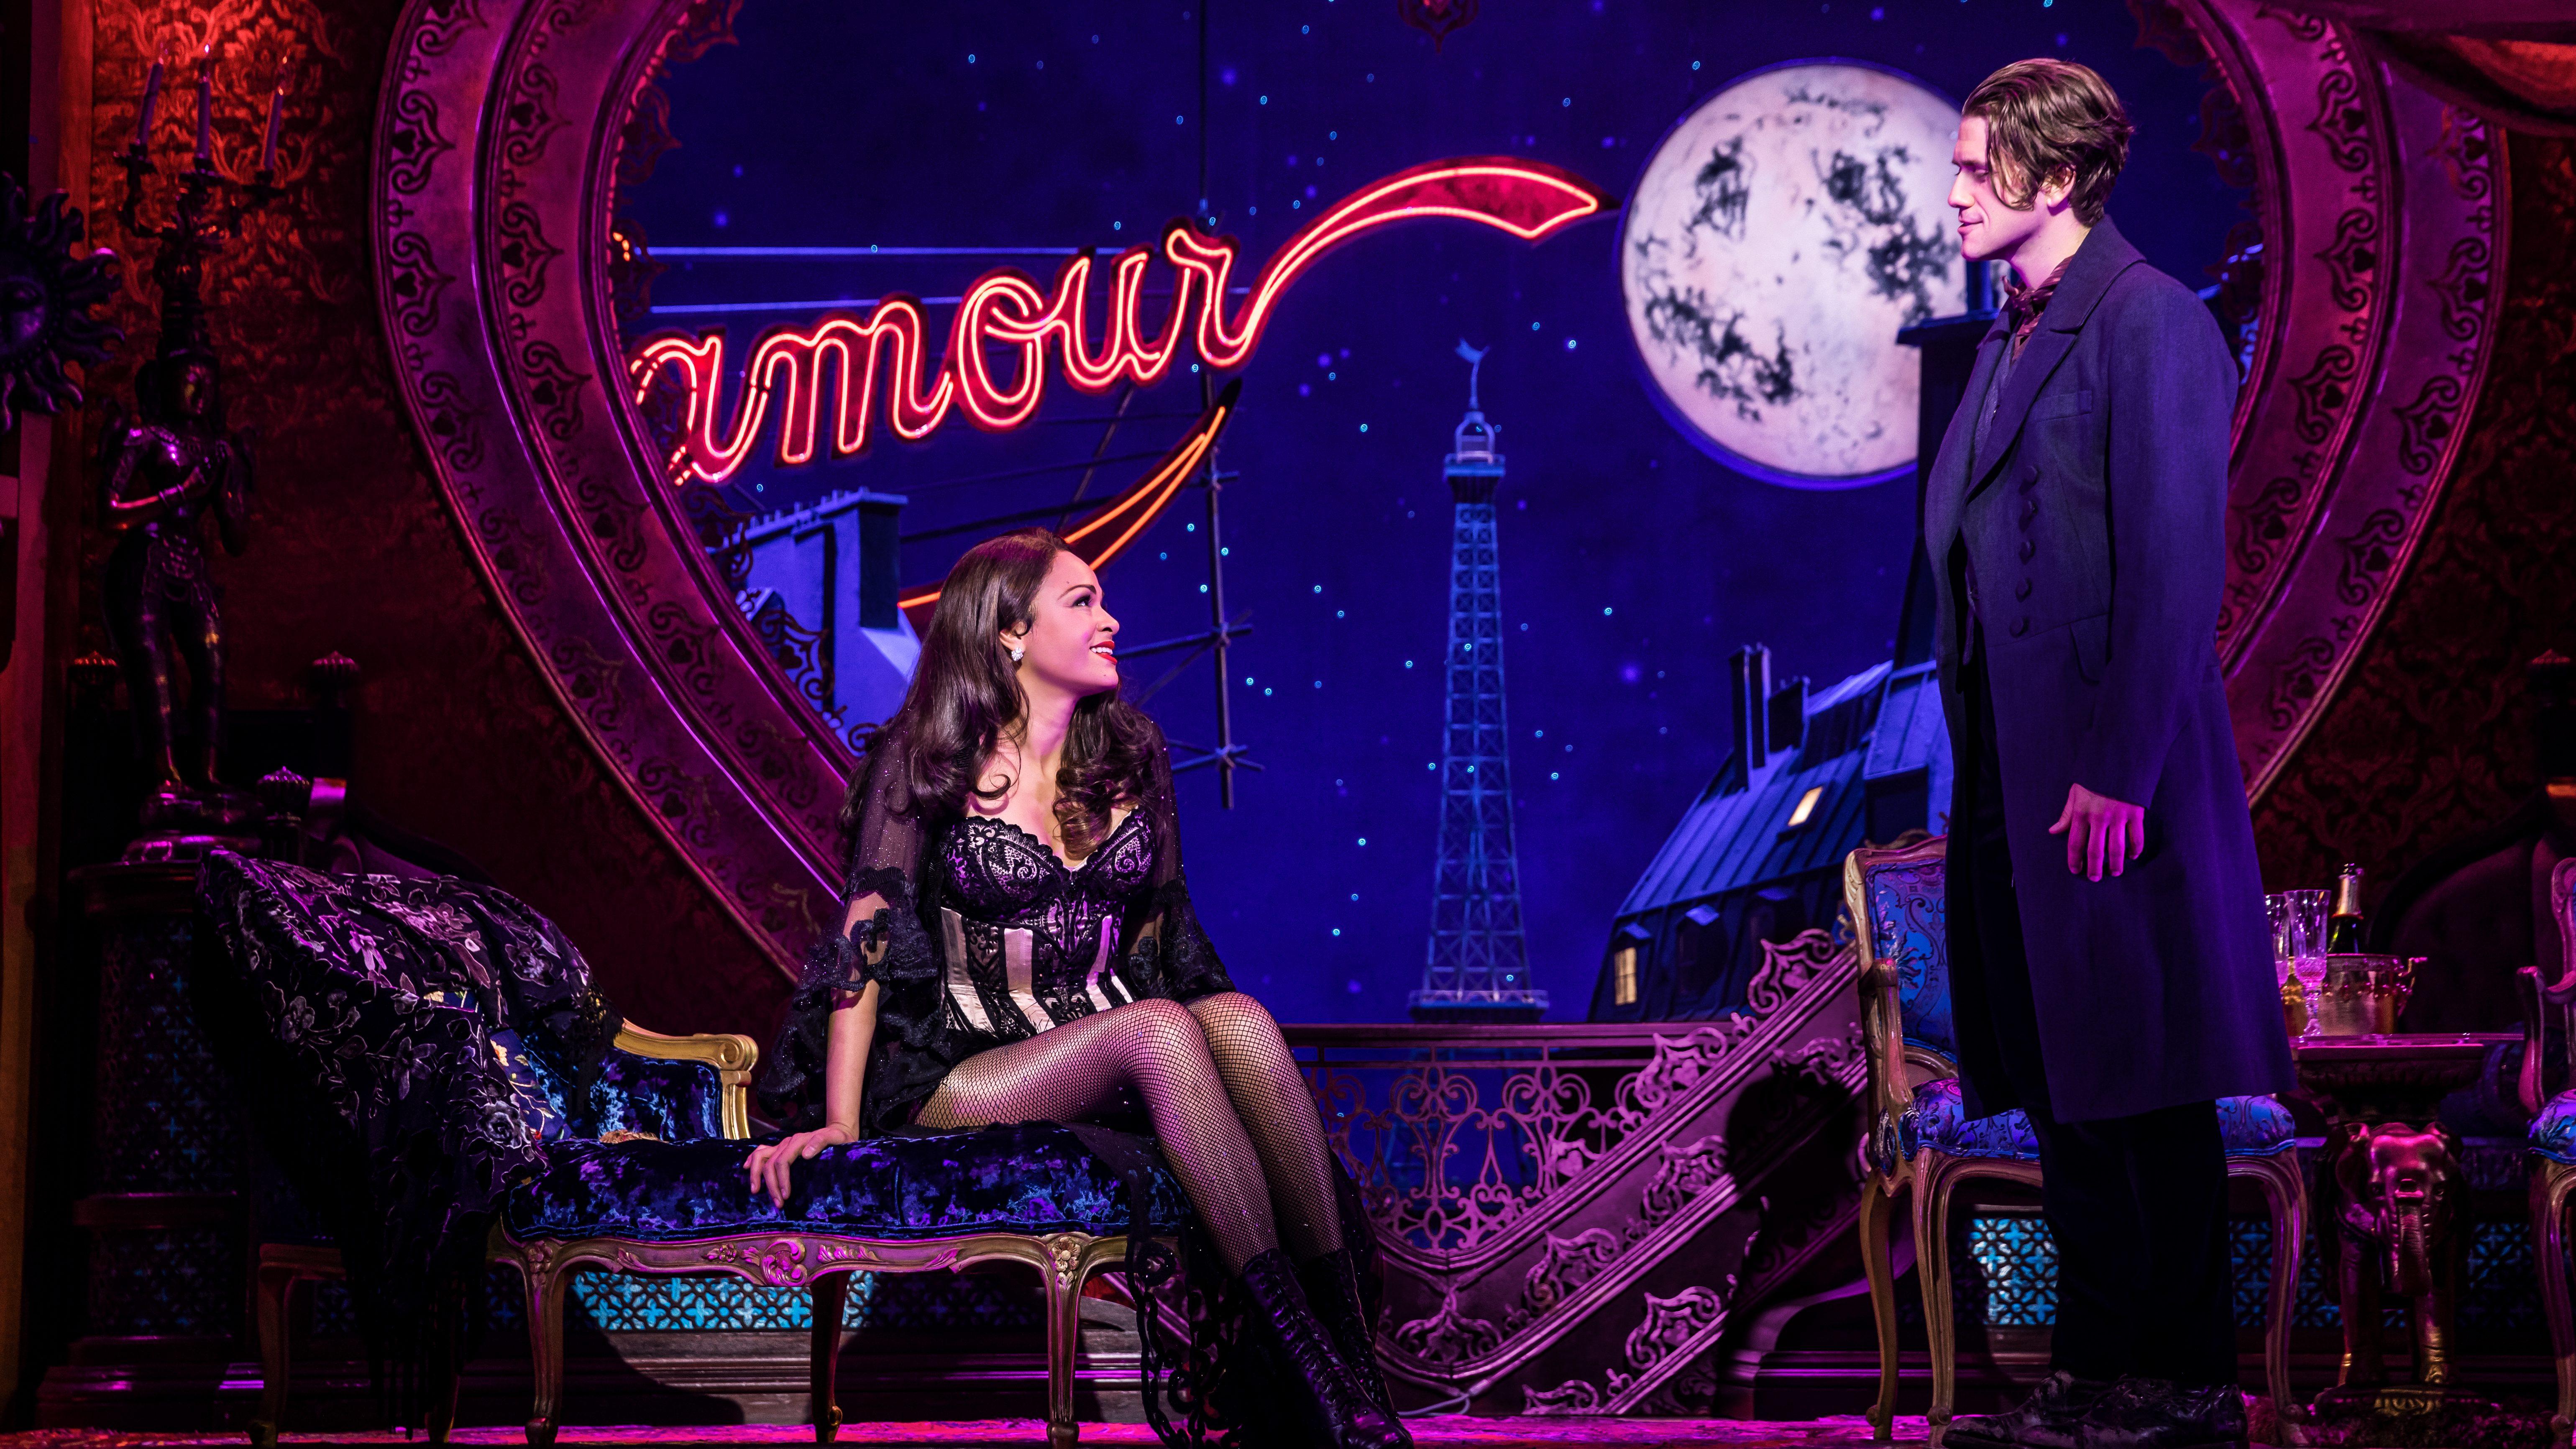 'Moulin Rouge!' Producers Bill Damaschke And Carmen Pavlovic On Show's New Resonance After 2020's Devastation